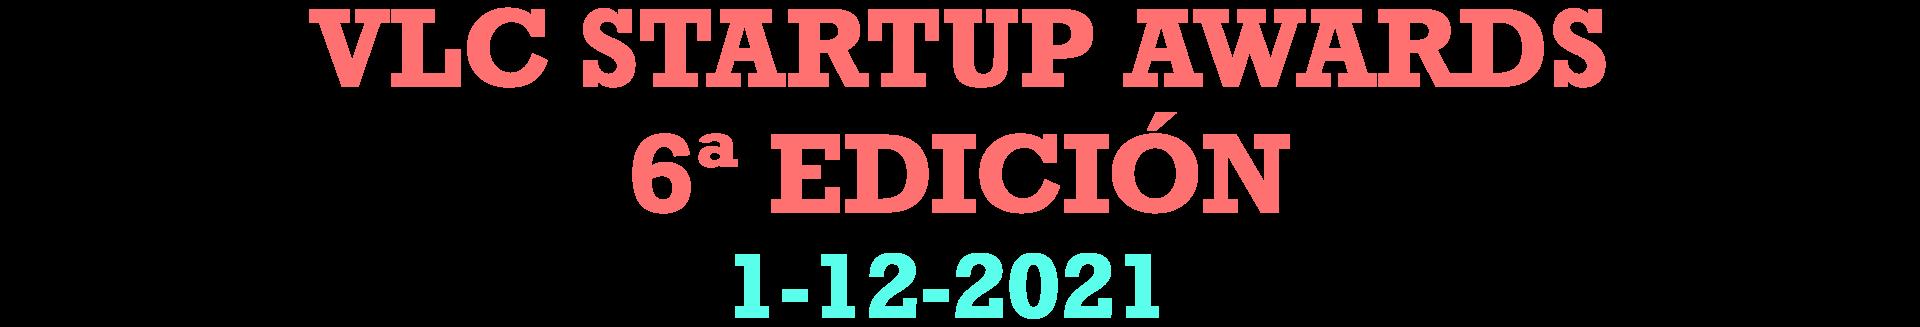 VLC Startup Awards 2021